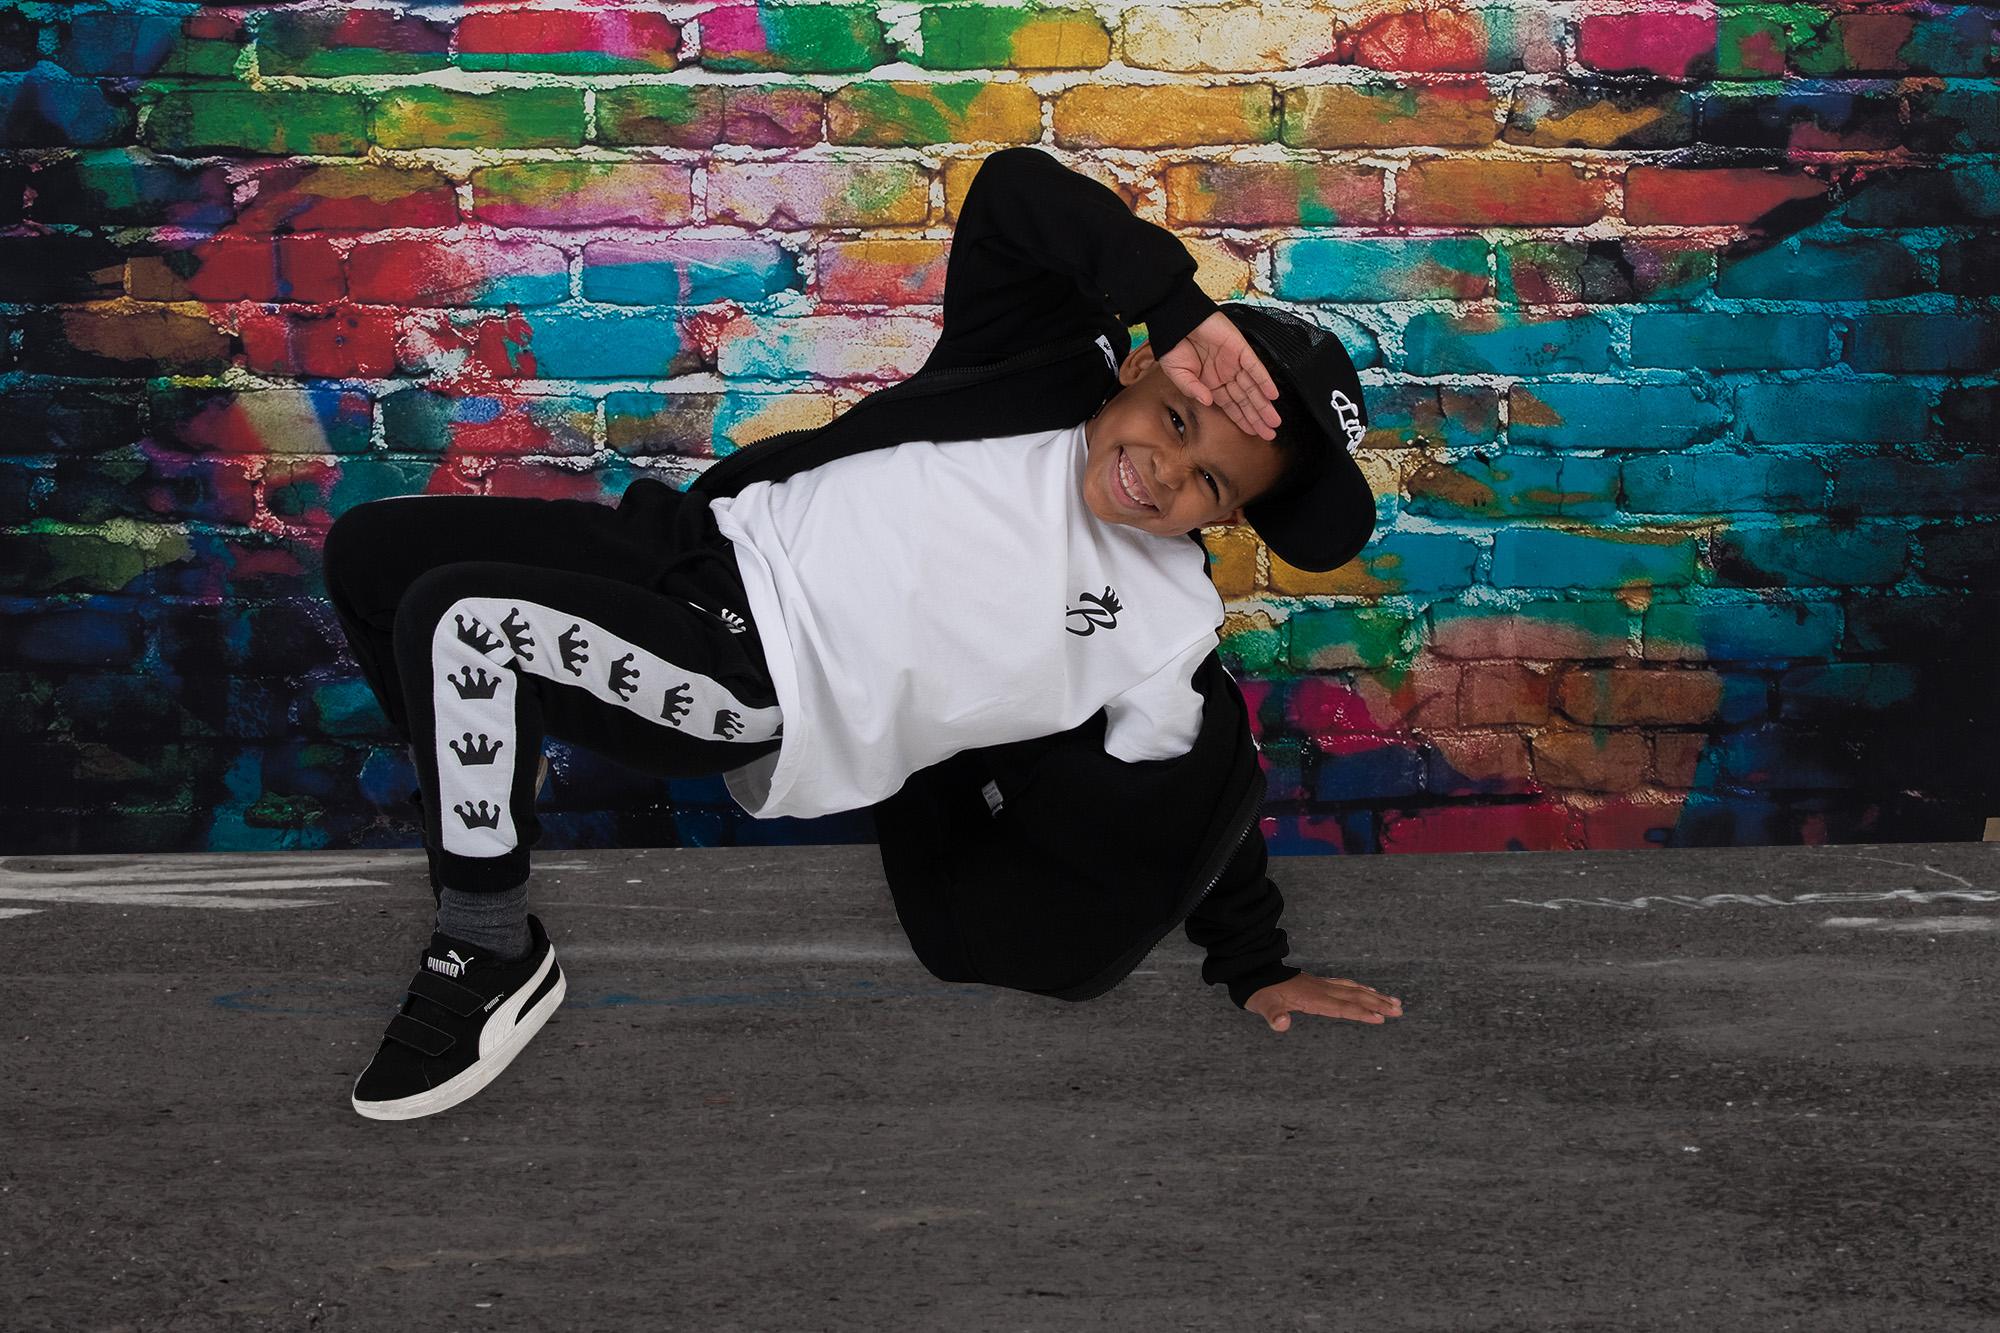 Lil Beatz Dancer Graffiti Wall